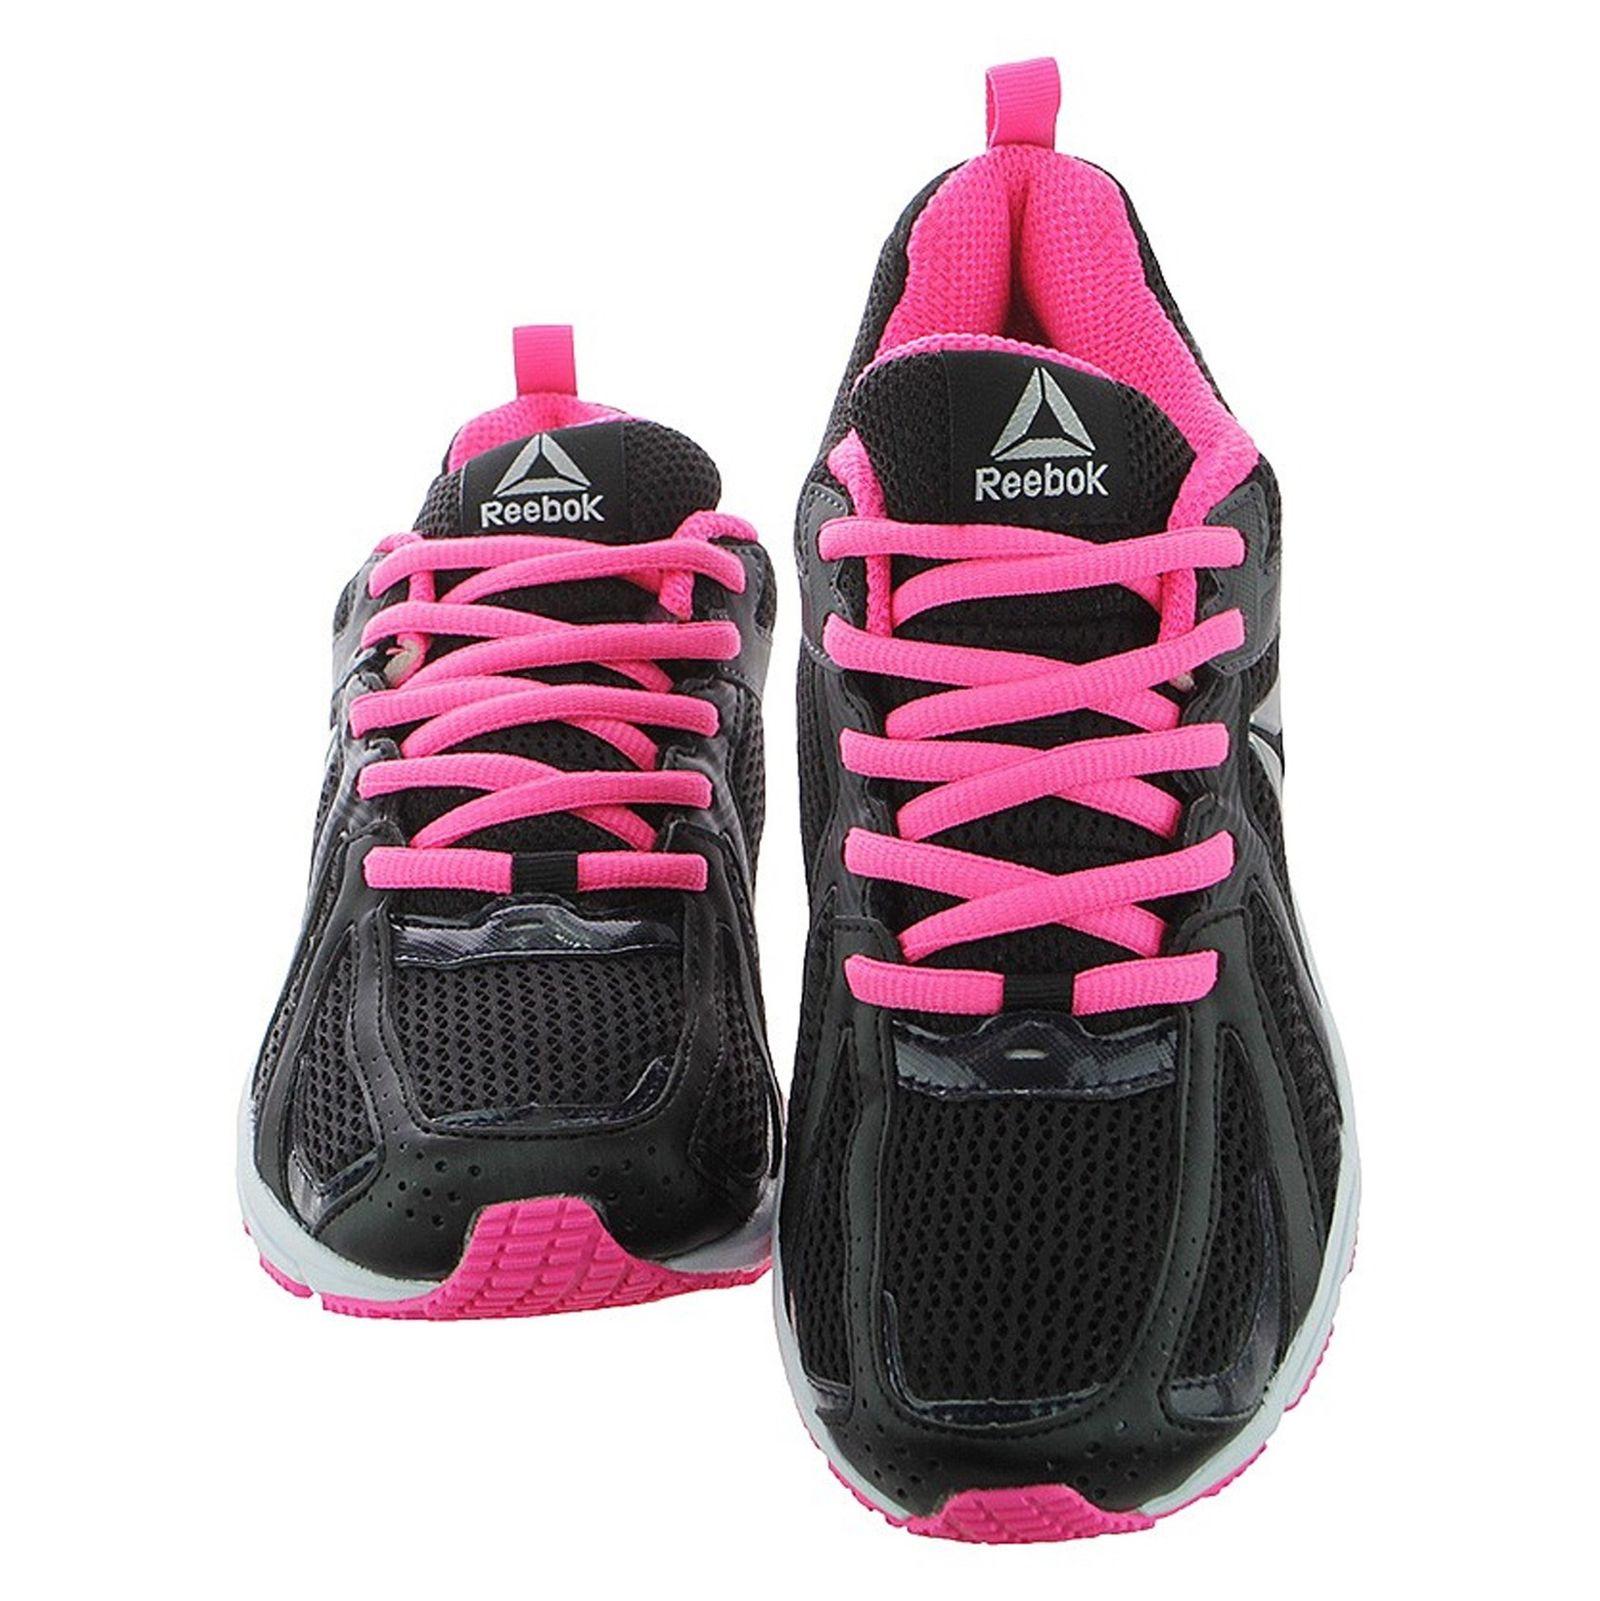 کفش دویدن زنانه Runner MT - ریباک - مشکي - 2